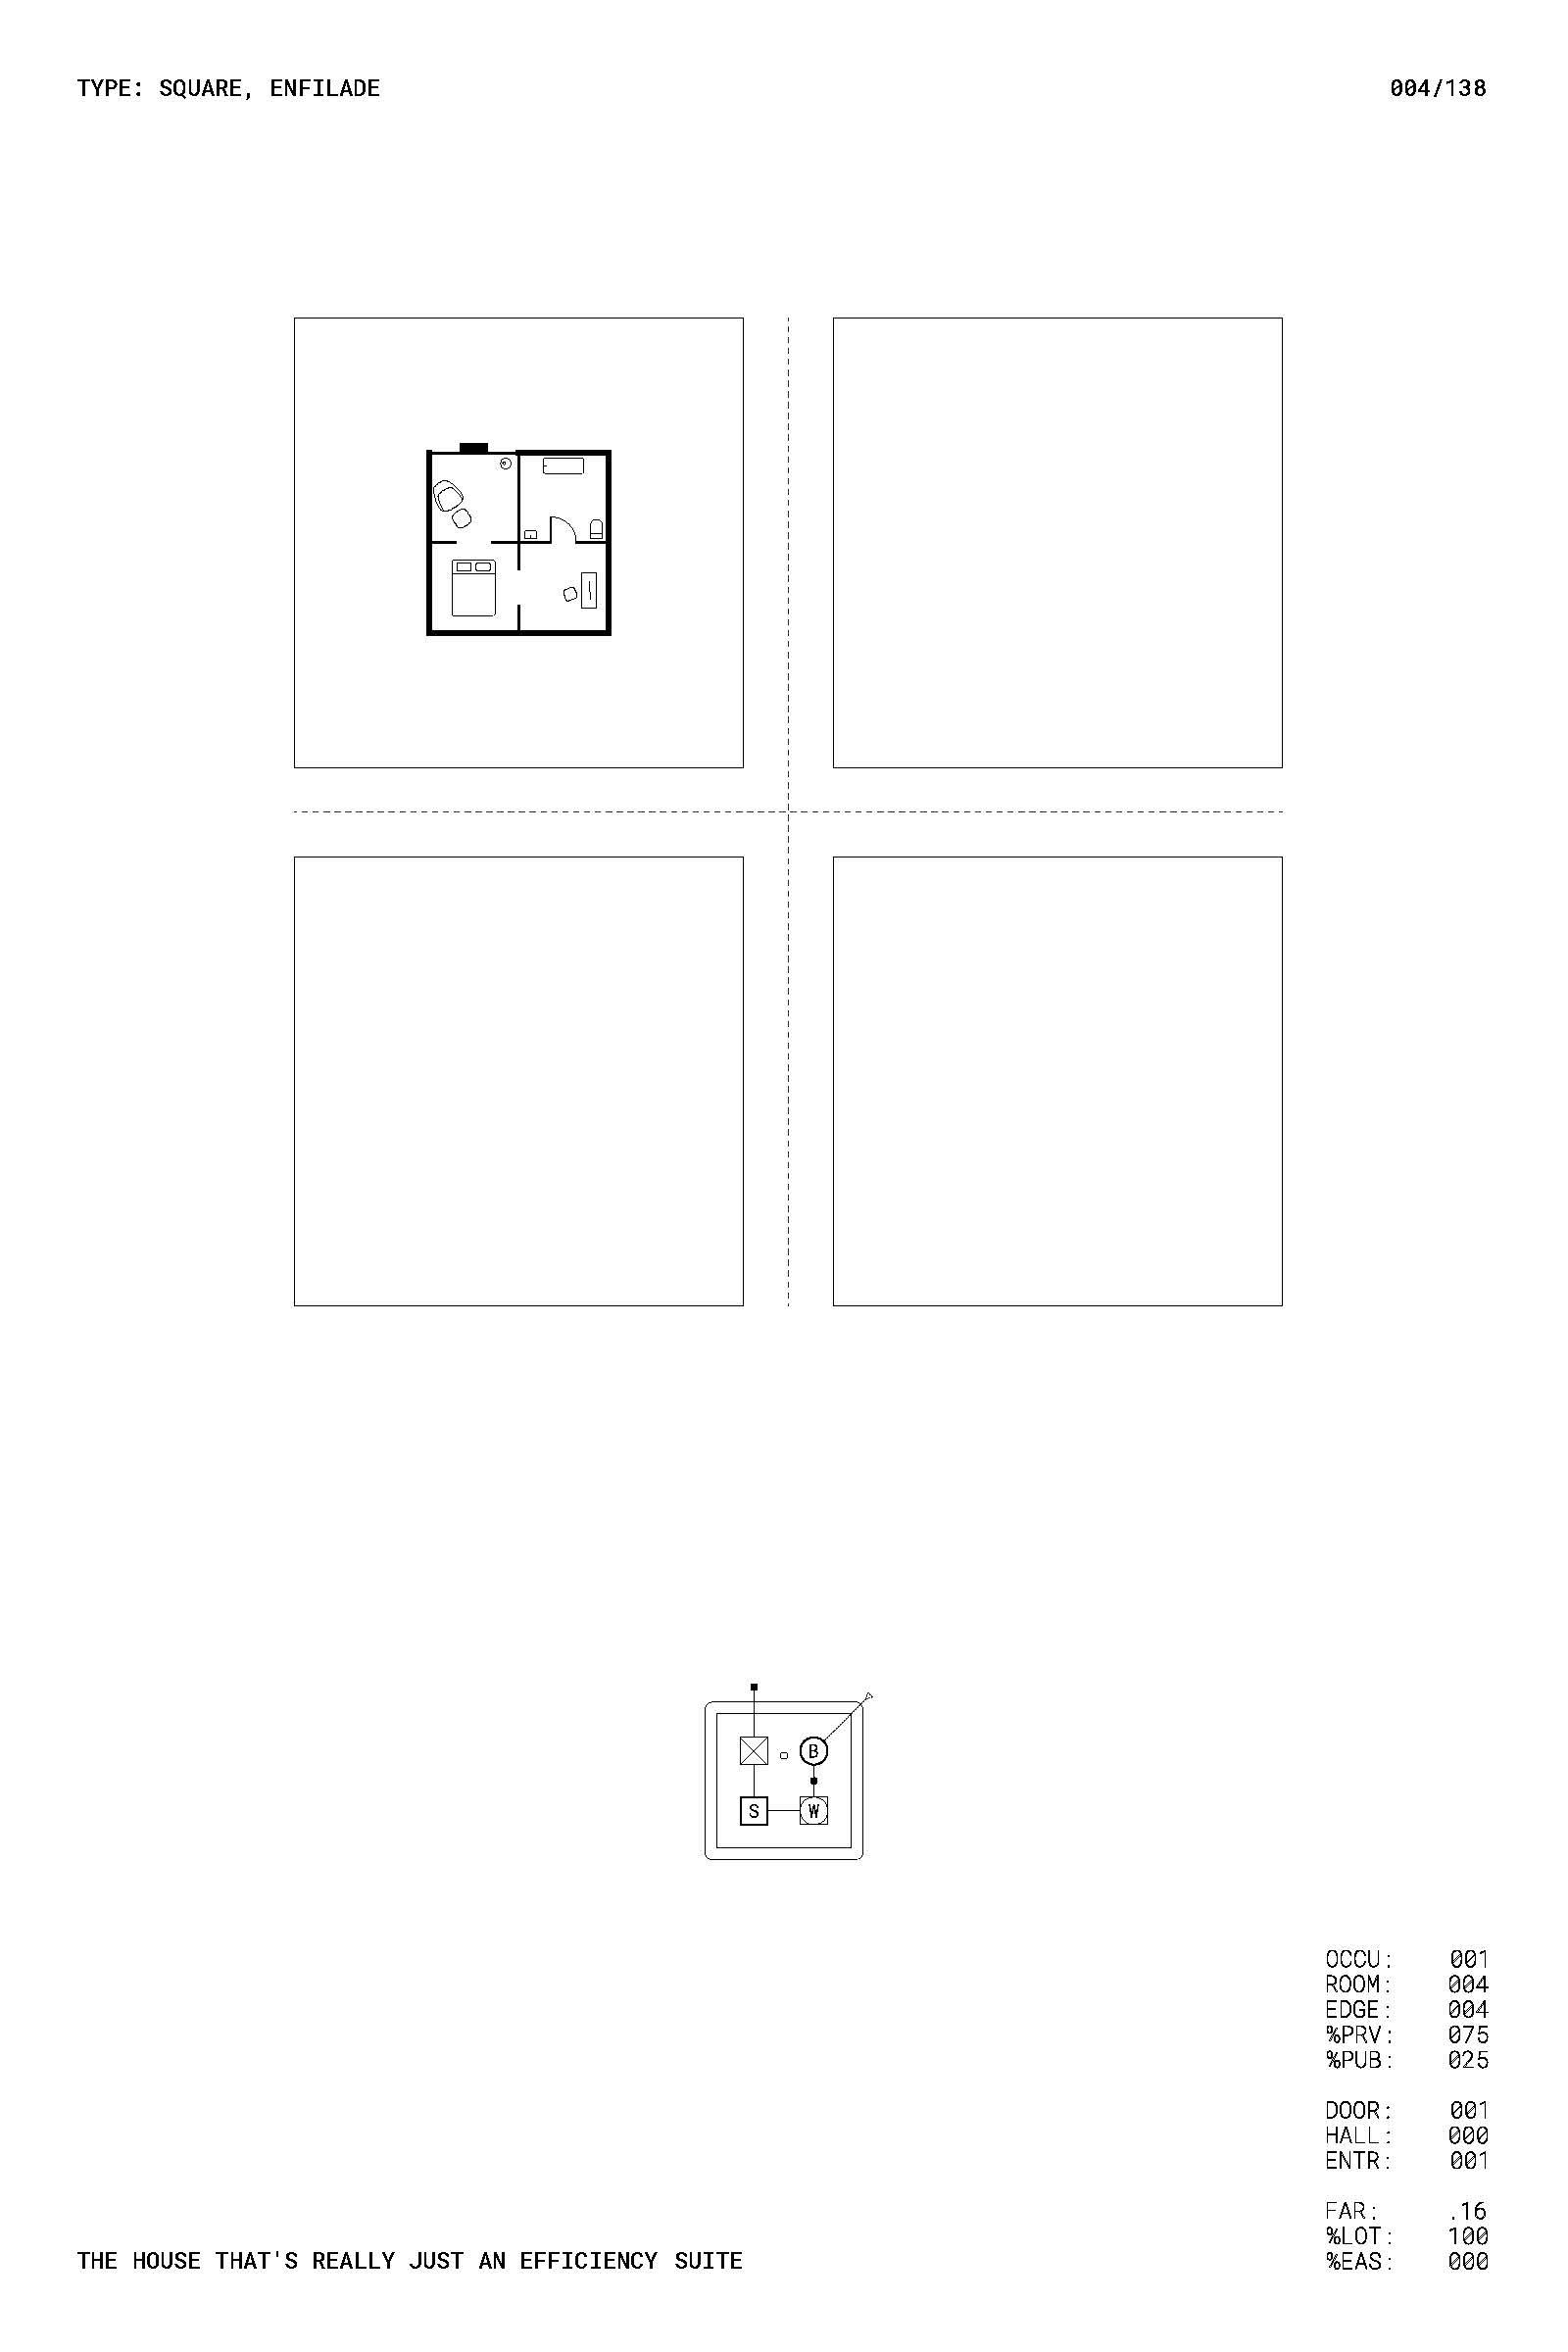 TYPES_004.jpg